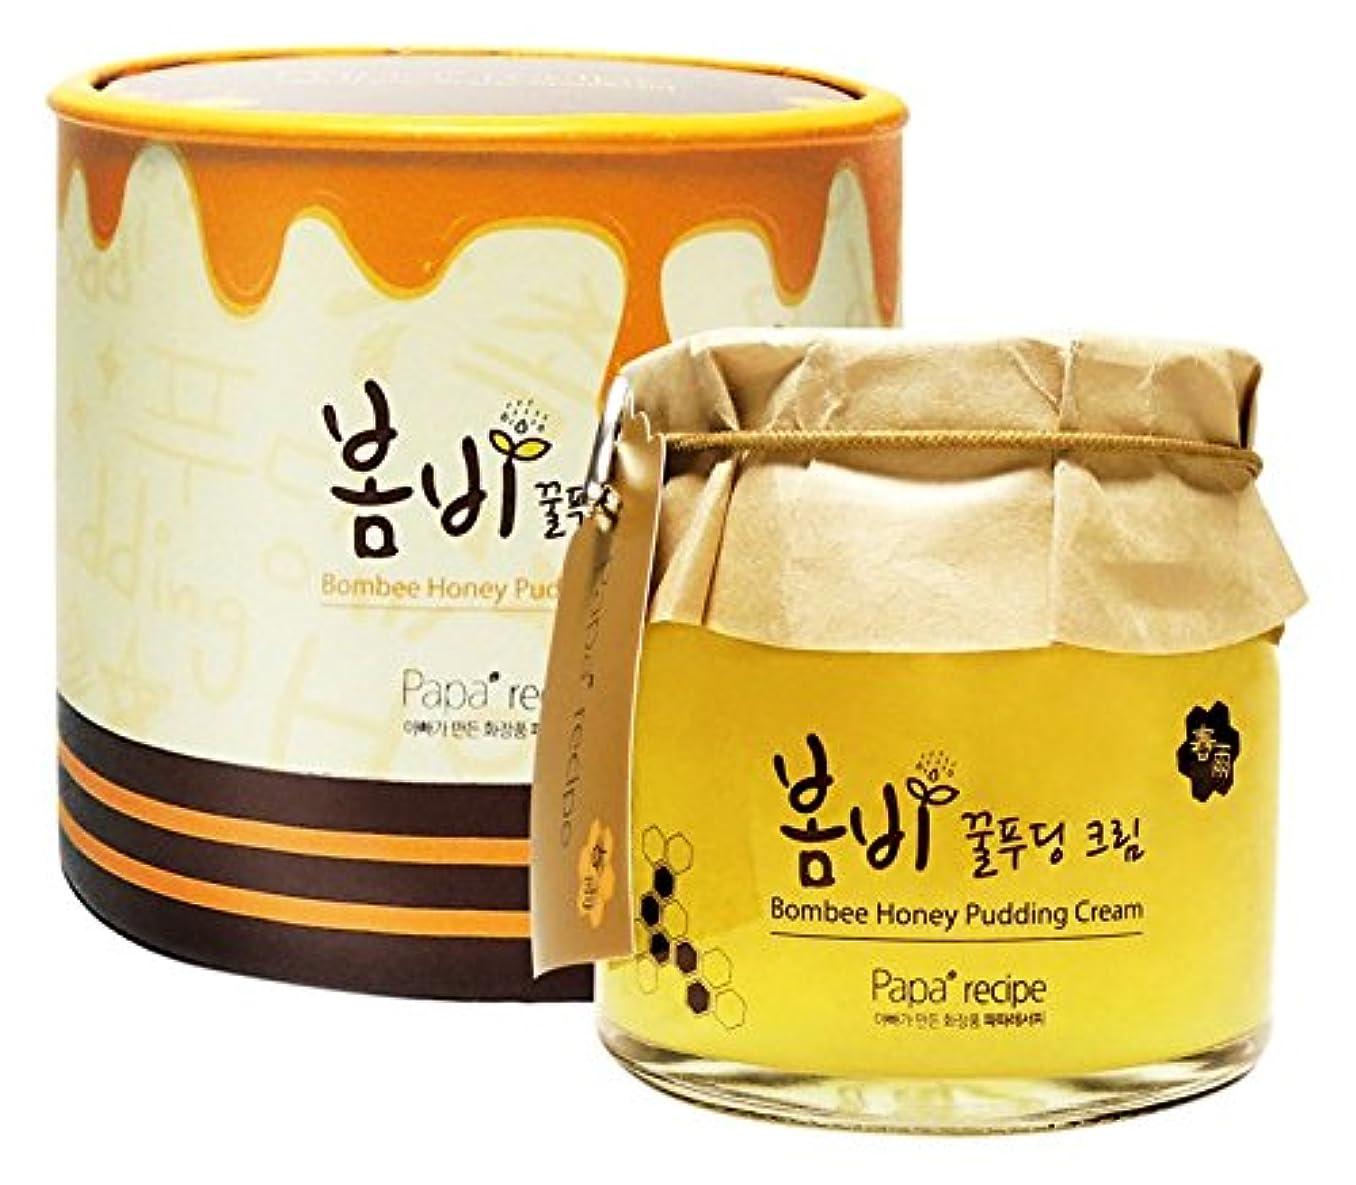 Papa recipe Bombee Honey Pudding Cream 135ml/パパレシピ ボムビー ハニー プリン クリーム 135ml